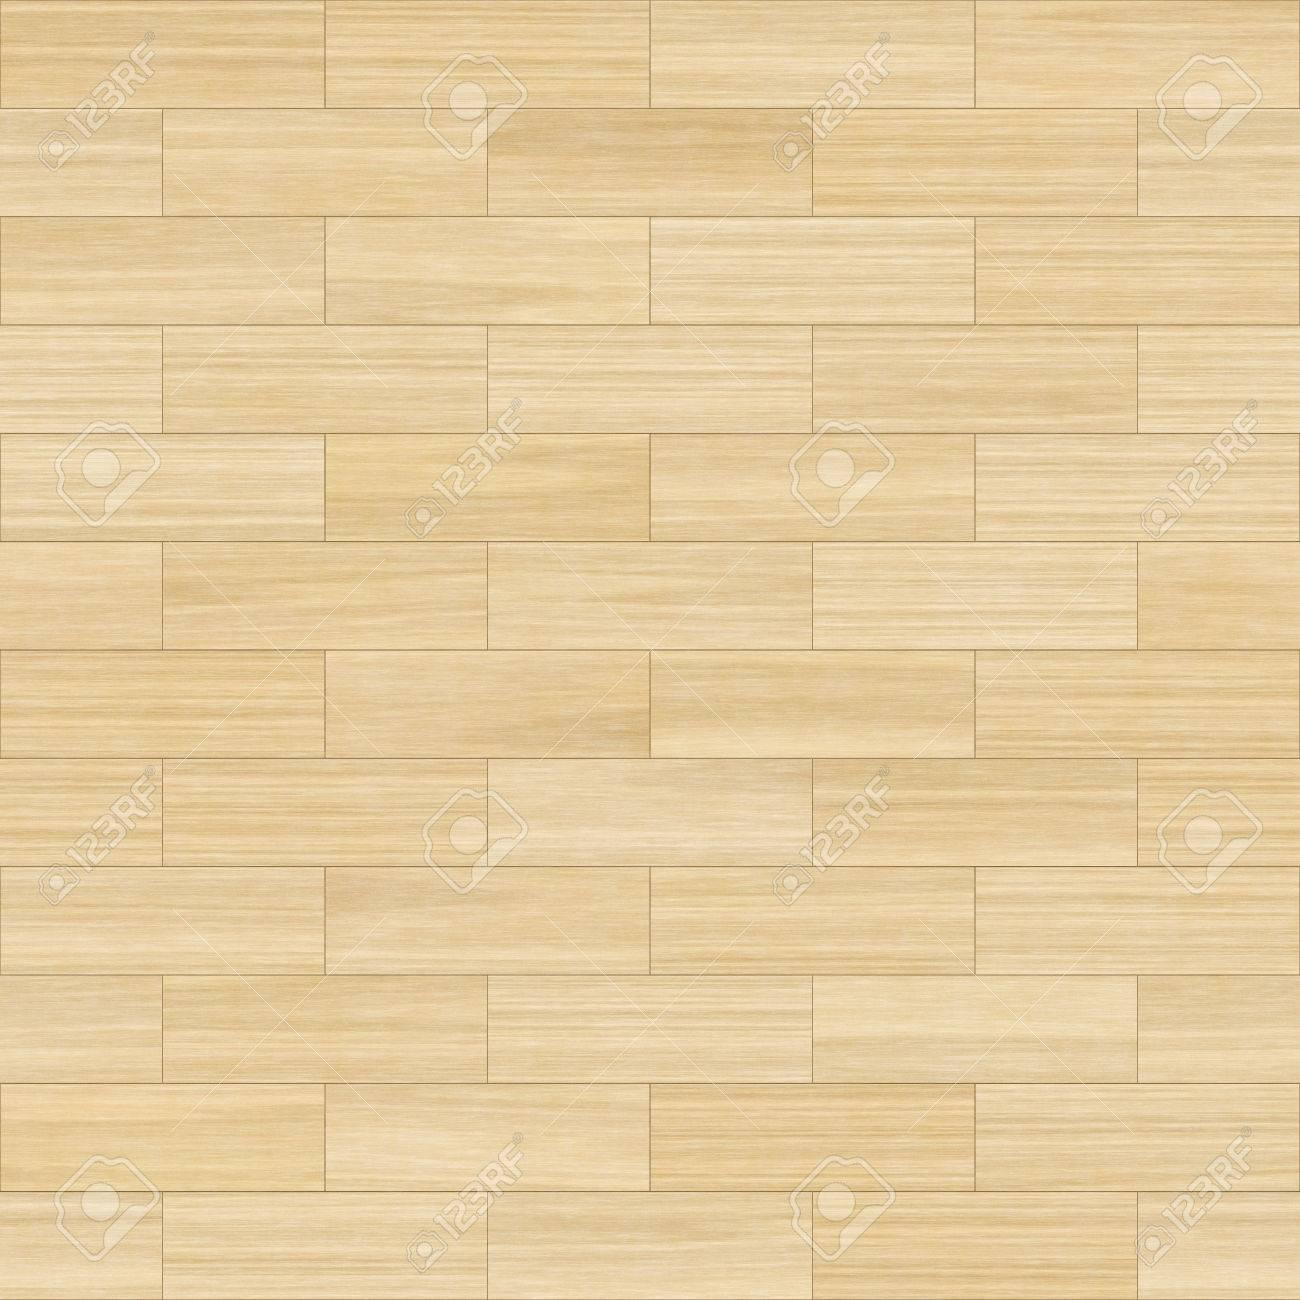 Background Texture Of Light Wood Floor Parquet